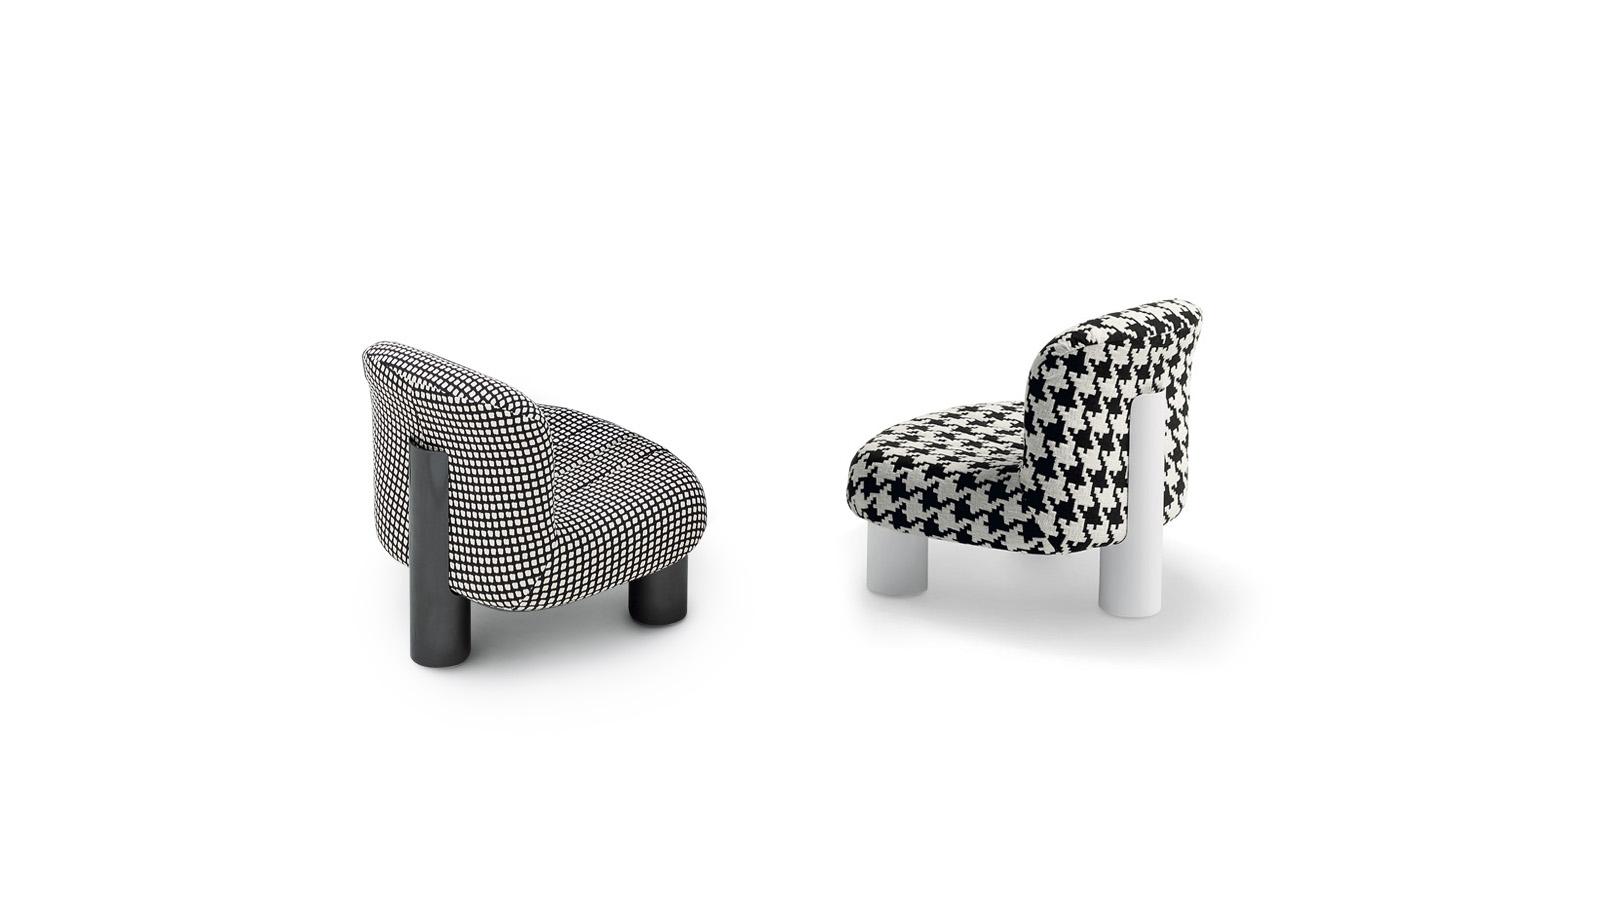 TinnappleMetz-arflex-botolo-Chair-11